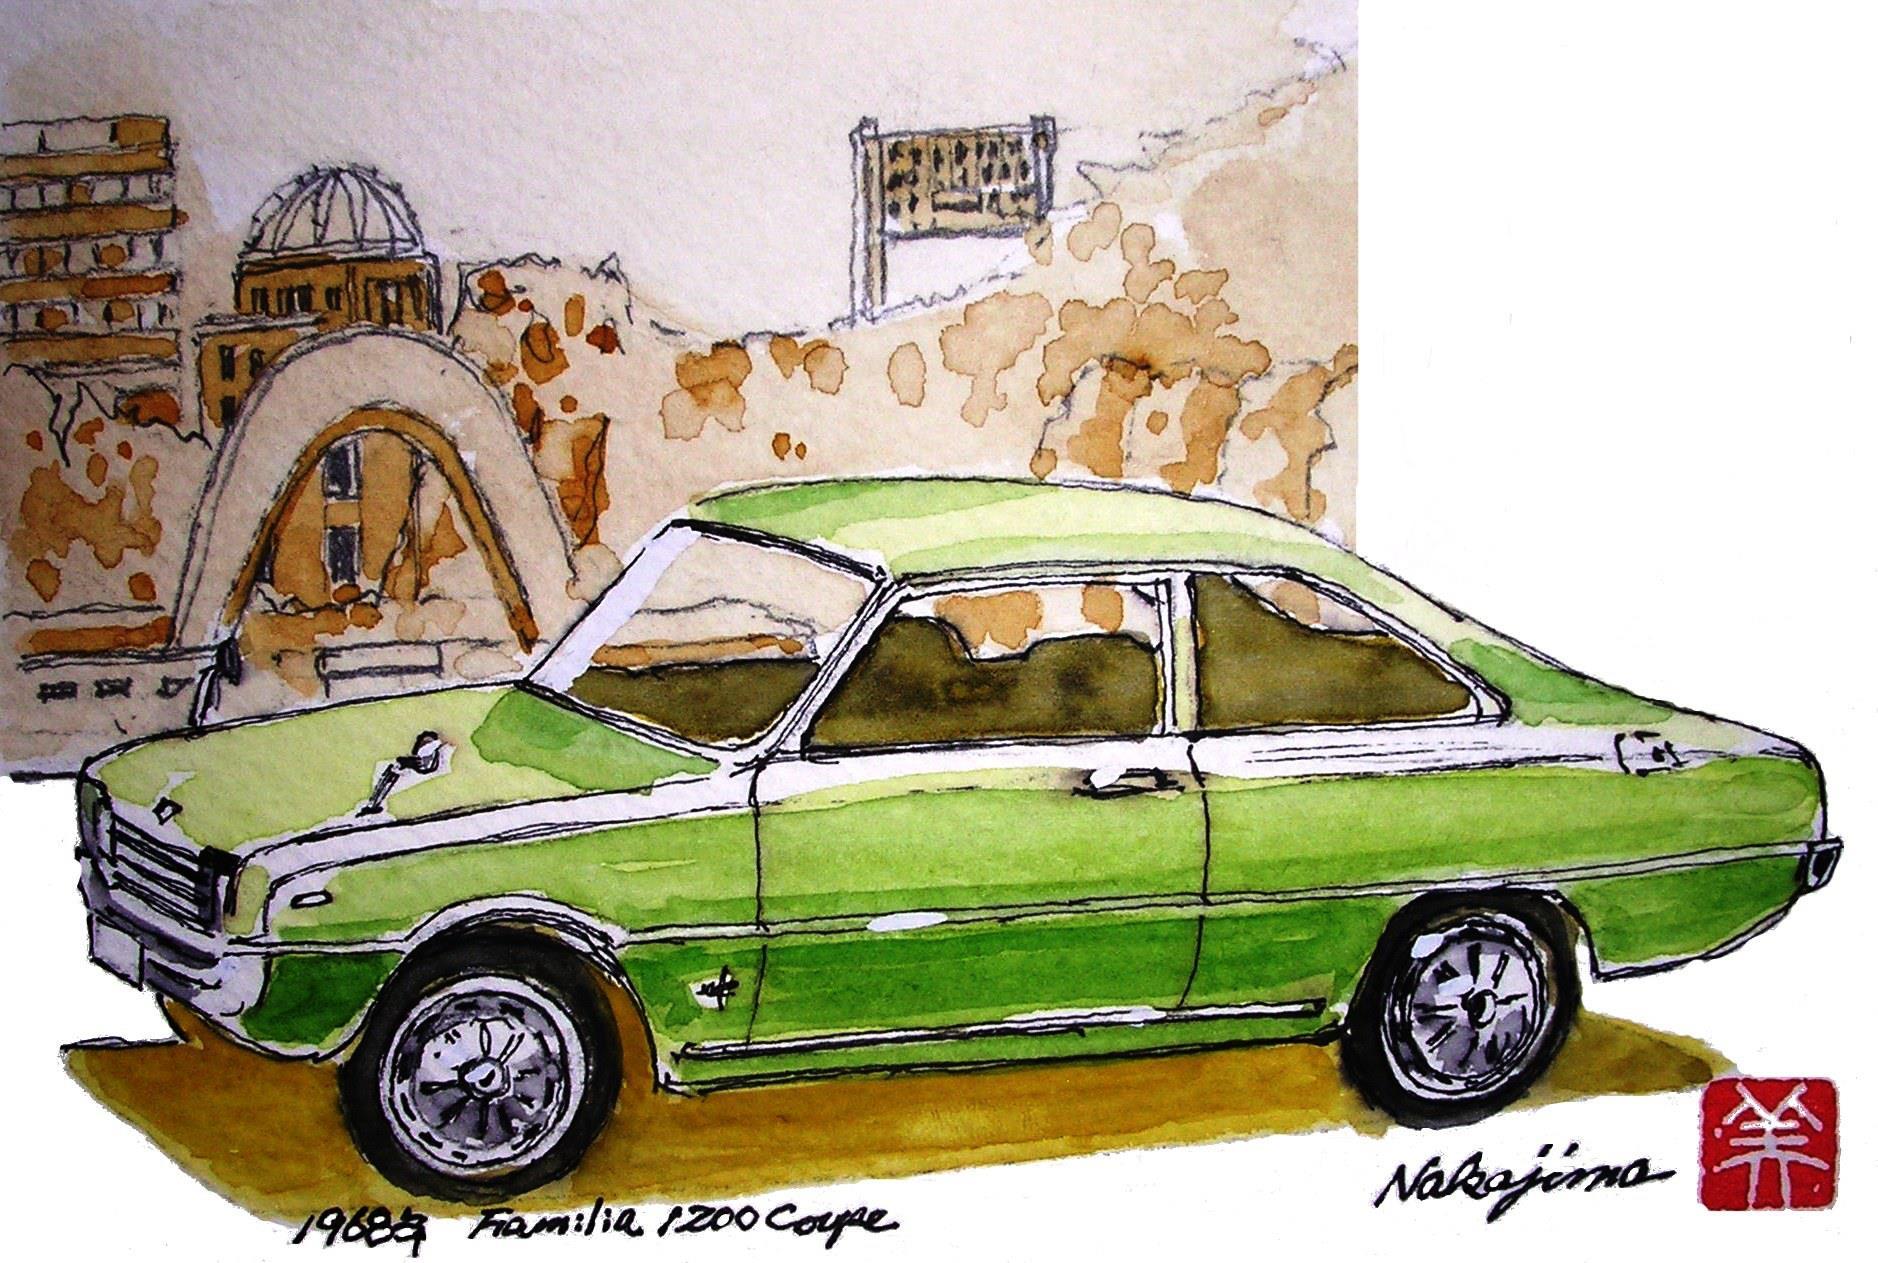 Wednesday Wall: Mazda watercolors by Miki Nakajima